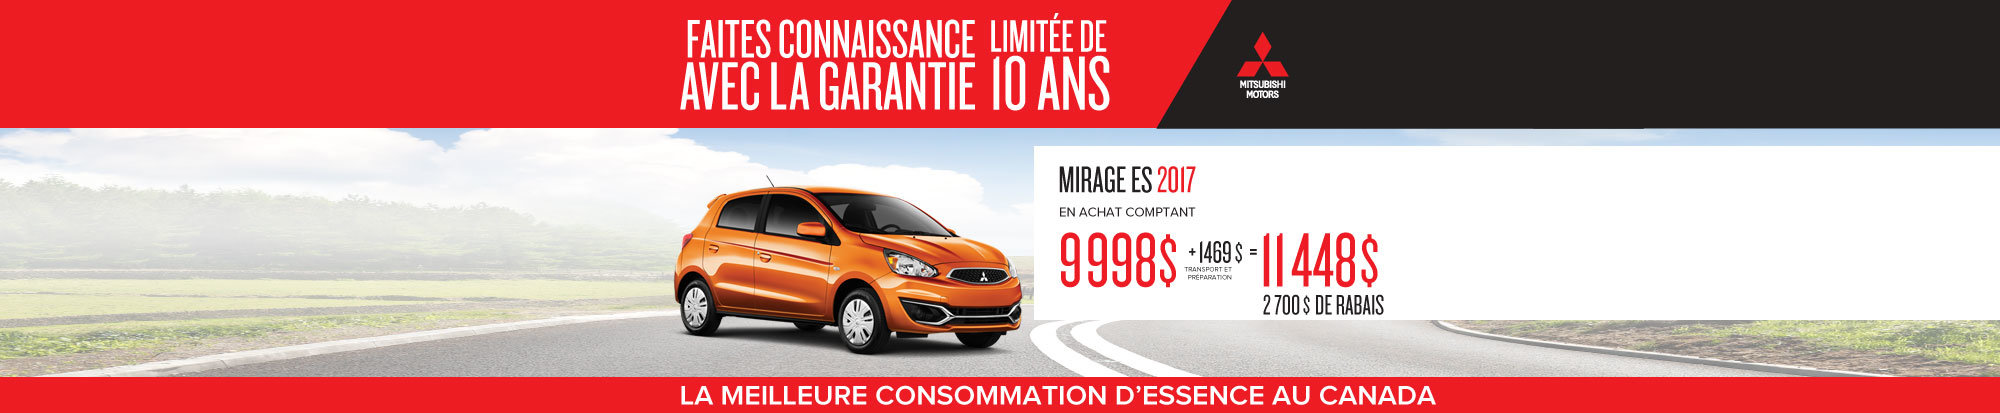 Mirage ES 2017